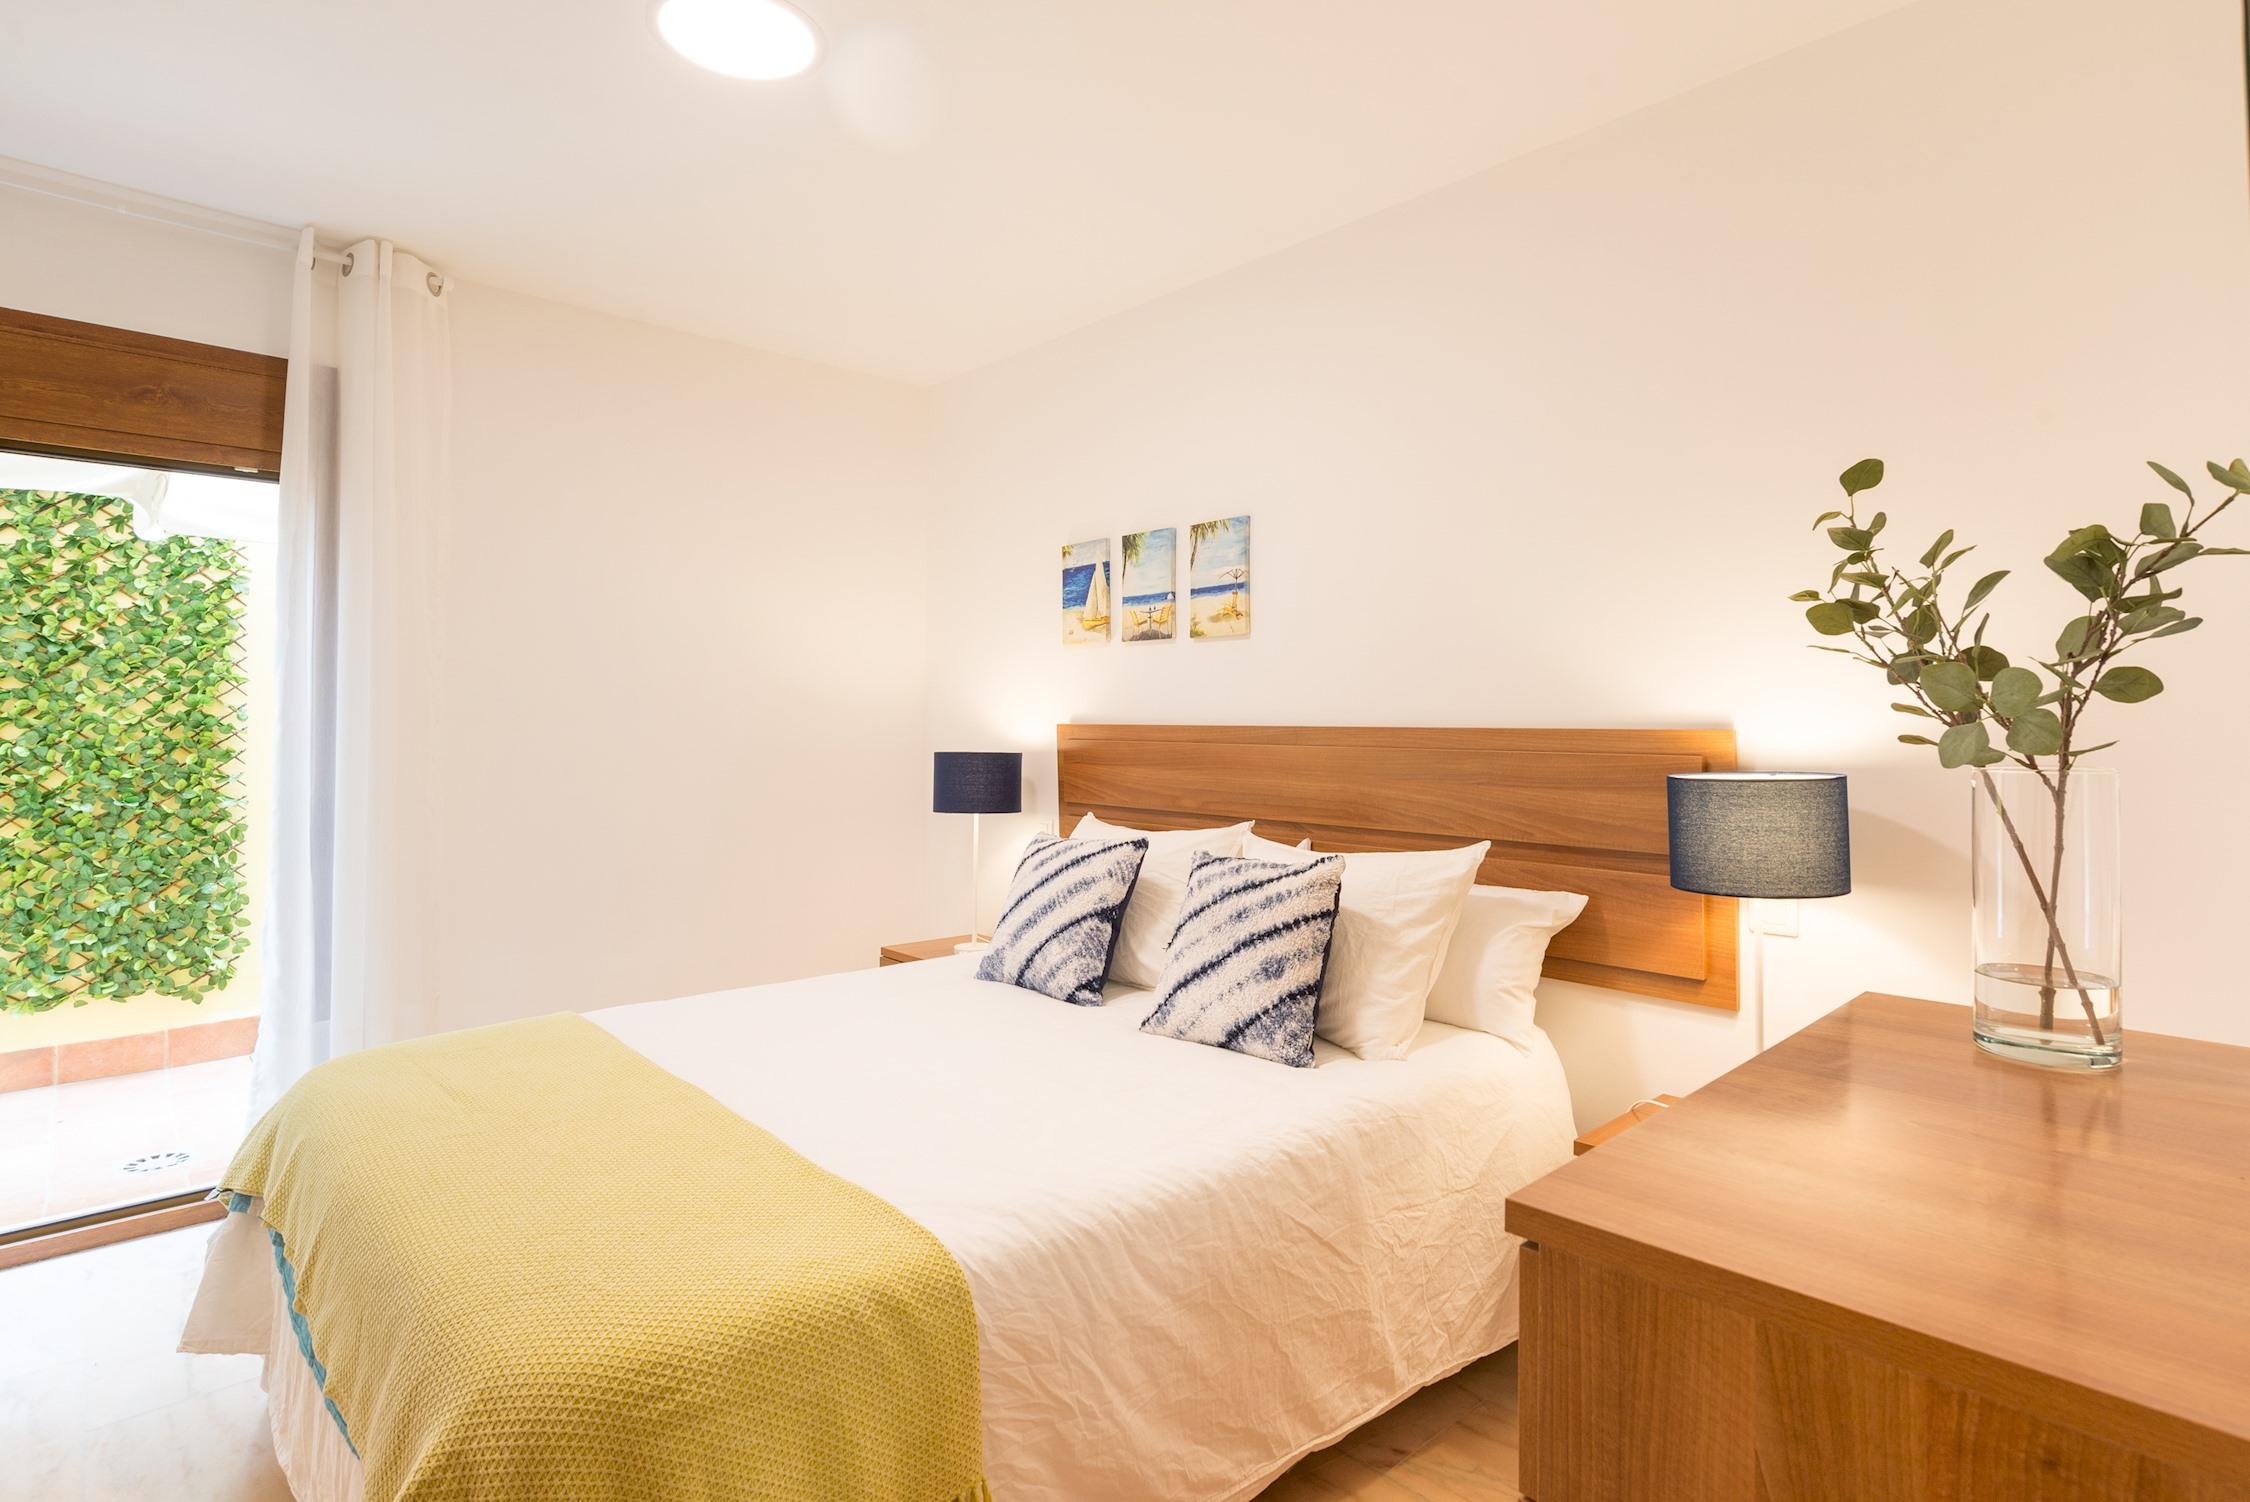 Apartment MalagaSuite Marbella Beach photo 25528488